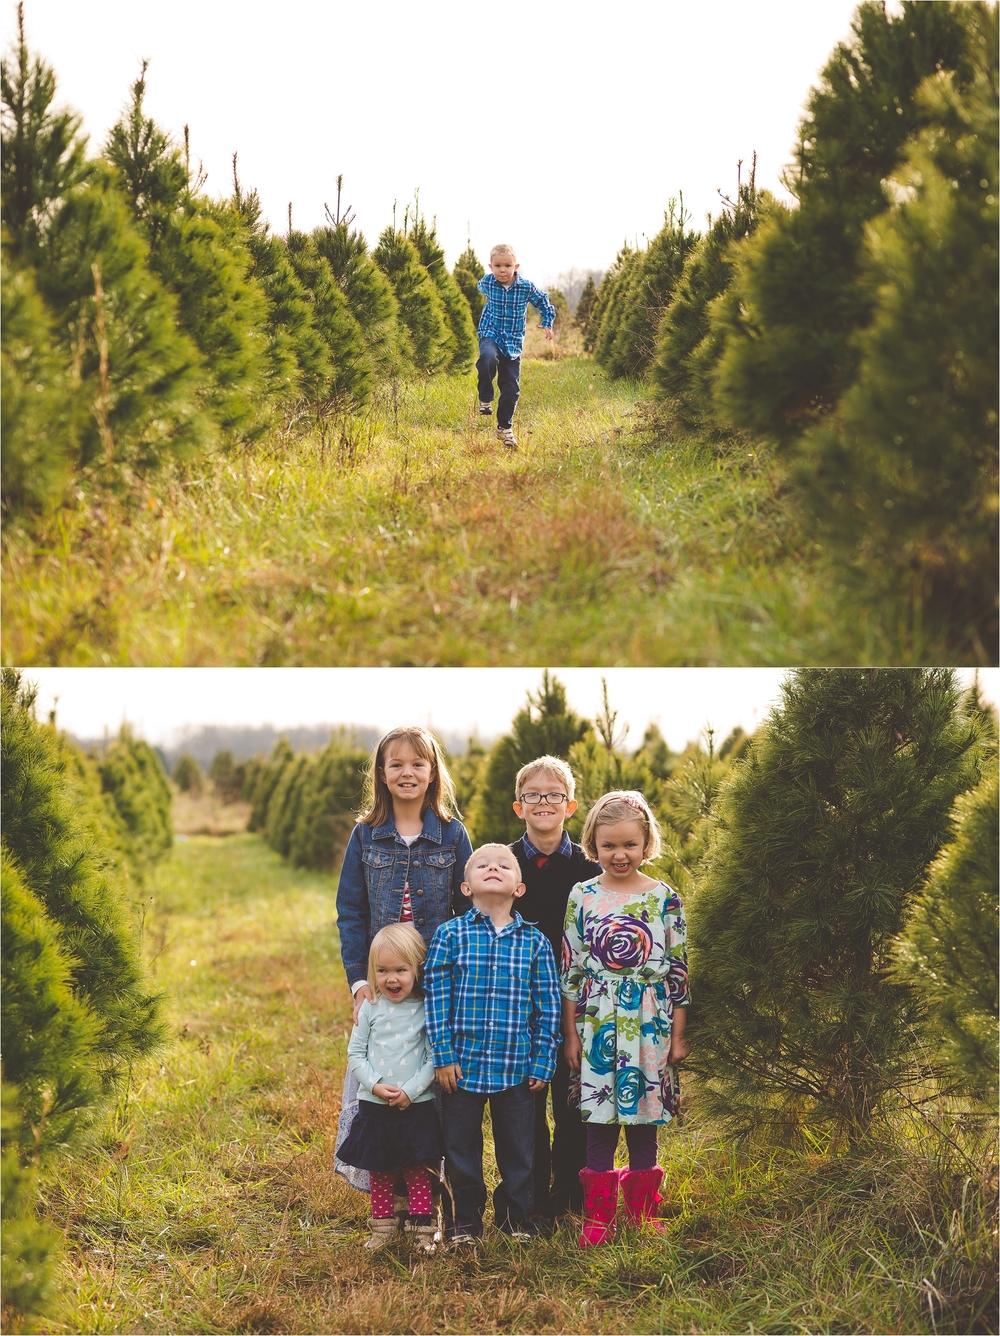 christmas-tree-farm-session-pnw-jannicka-mayte_0004.jpg